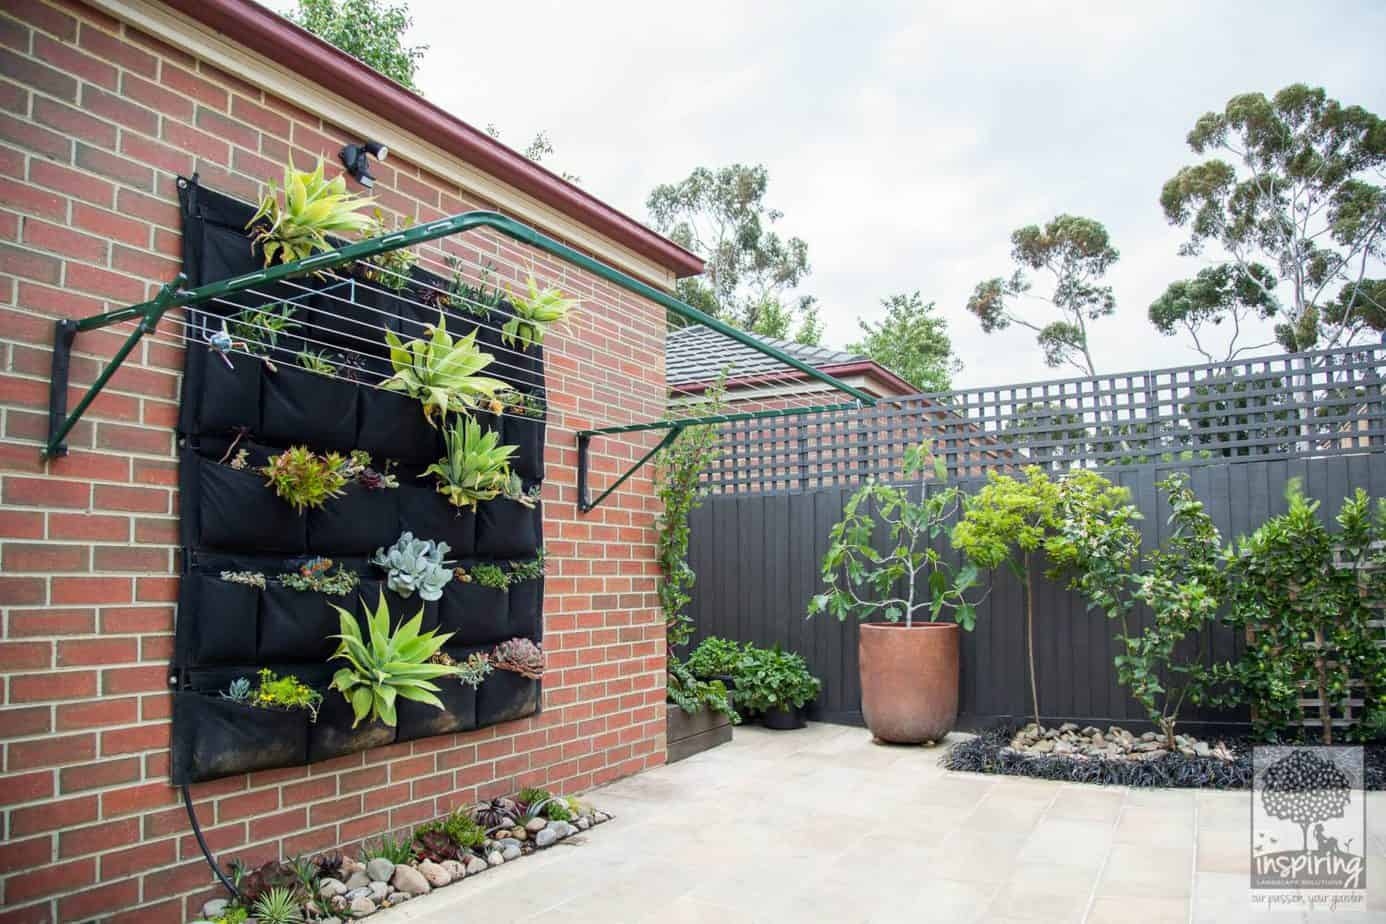 Bundoora garden design with sandstone paving and edible planting